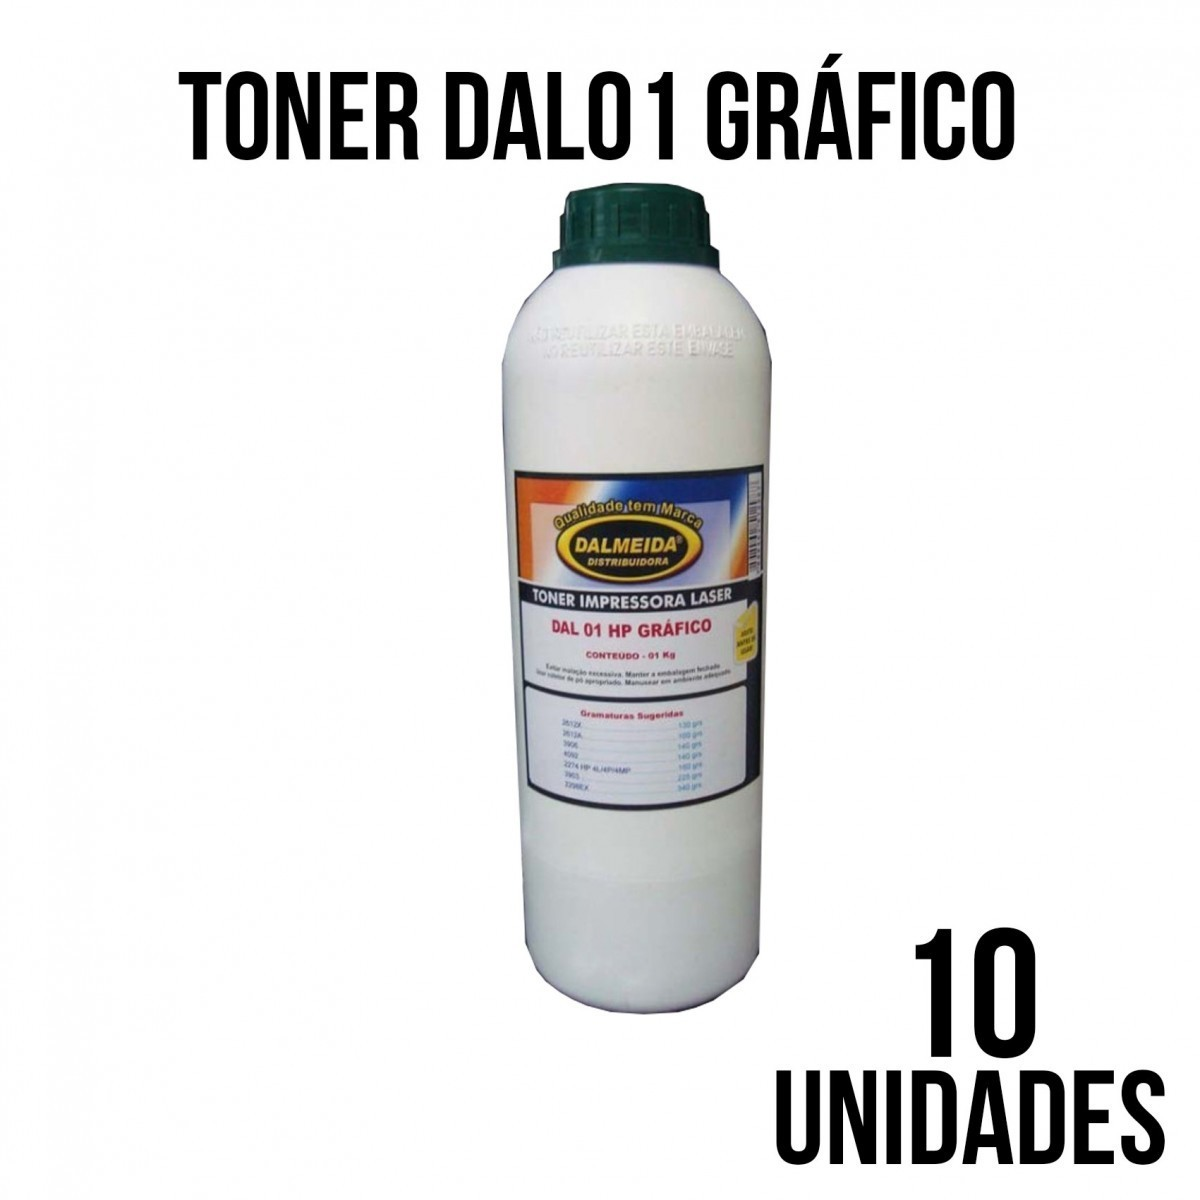 TONER DAL 01 HP GRAFICO - COMBO COM 10 KILOS